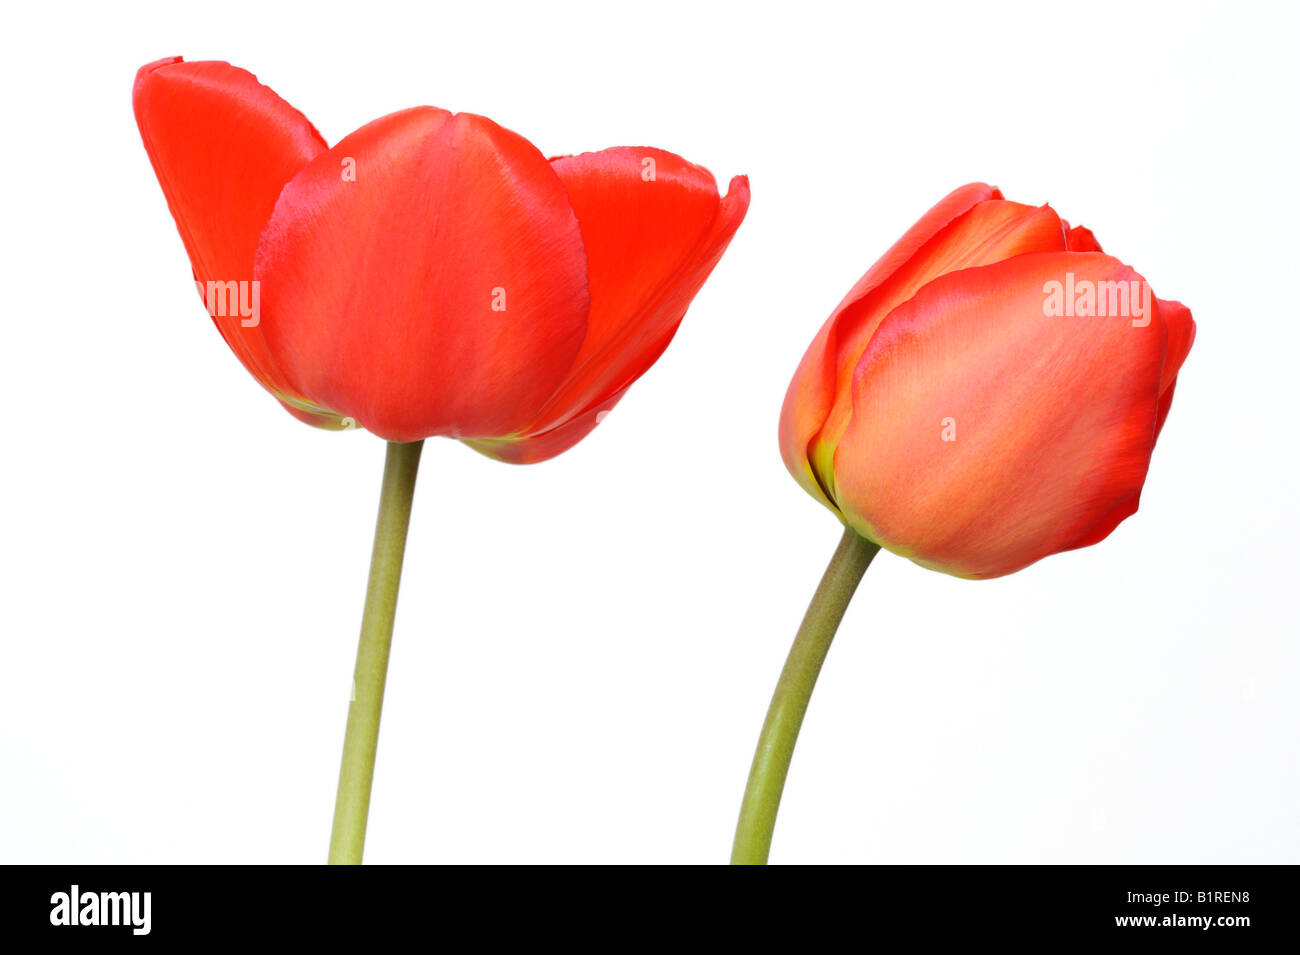 Red Tulips (Tulipa) - Stock Image